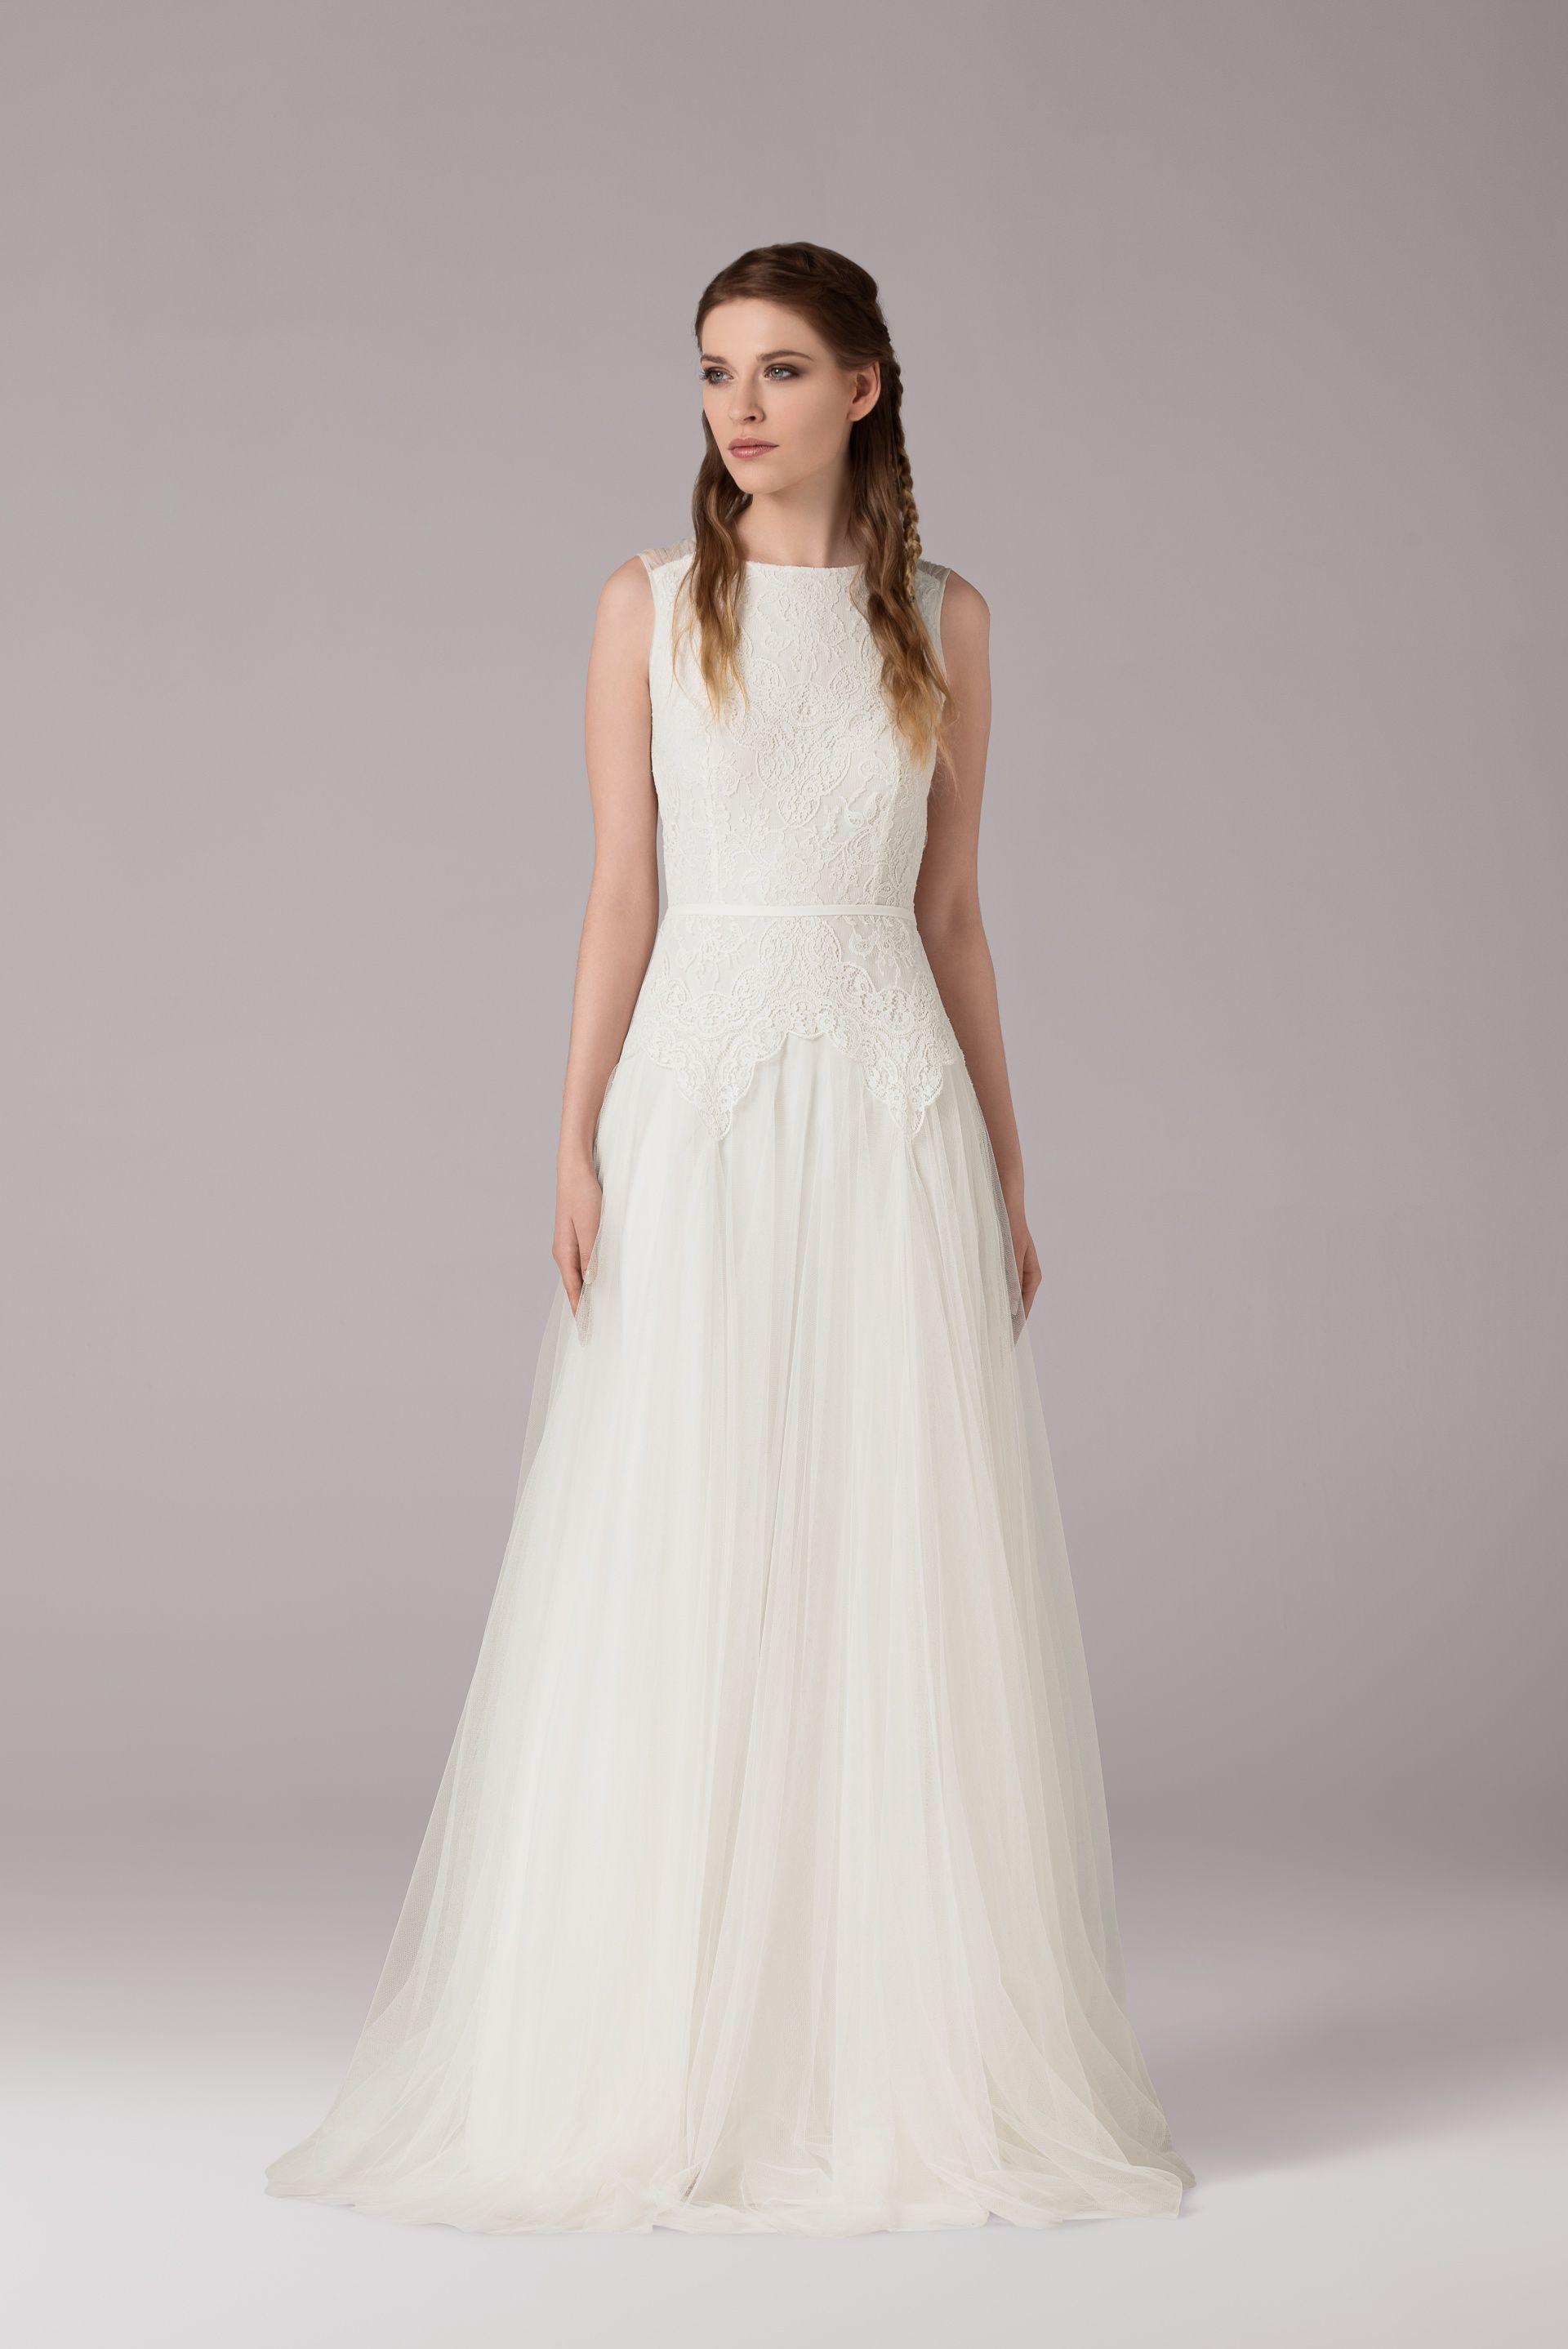 ZOHRA bridal collection Kollektion 2015